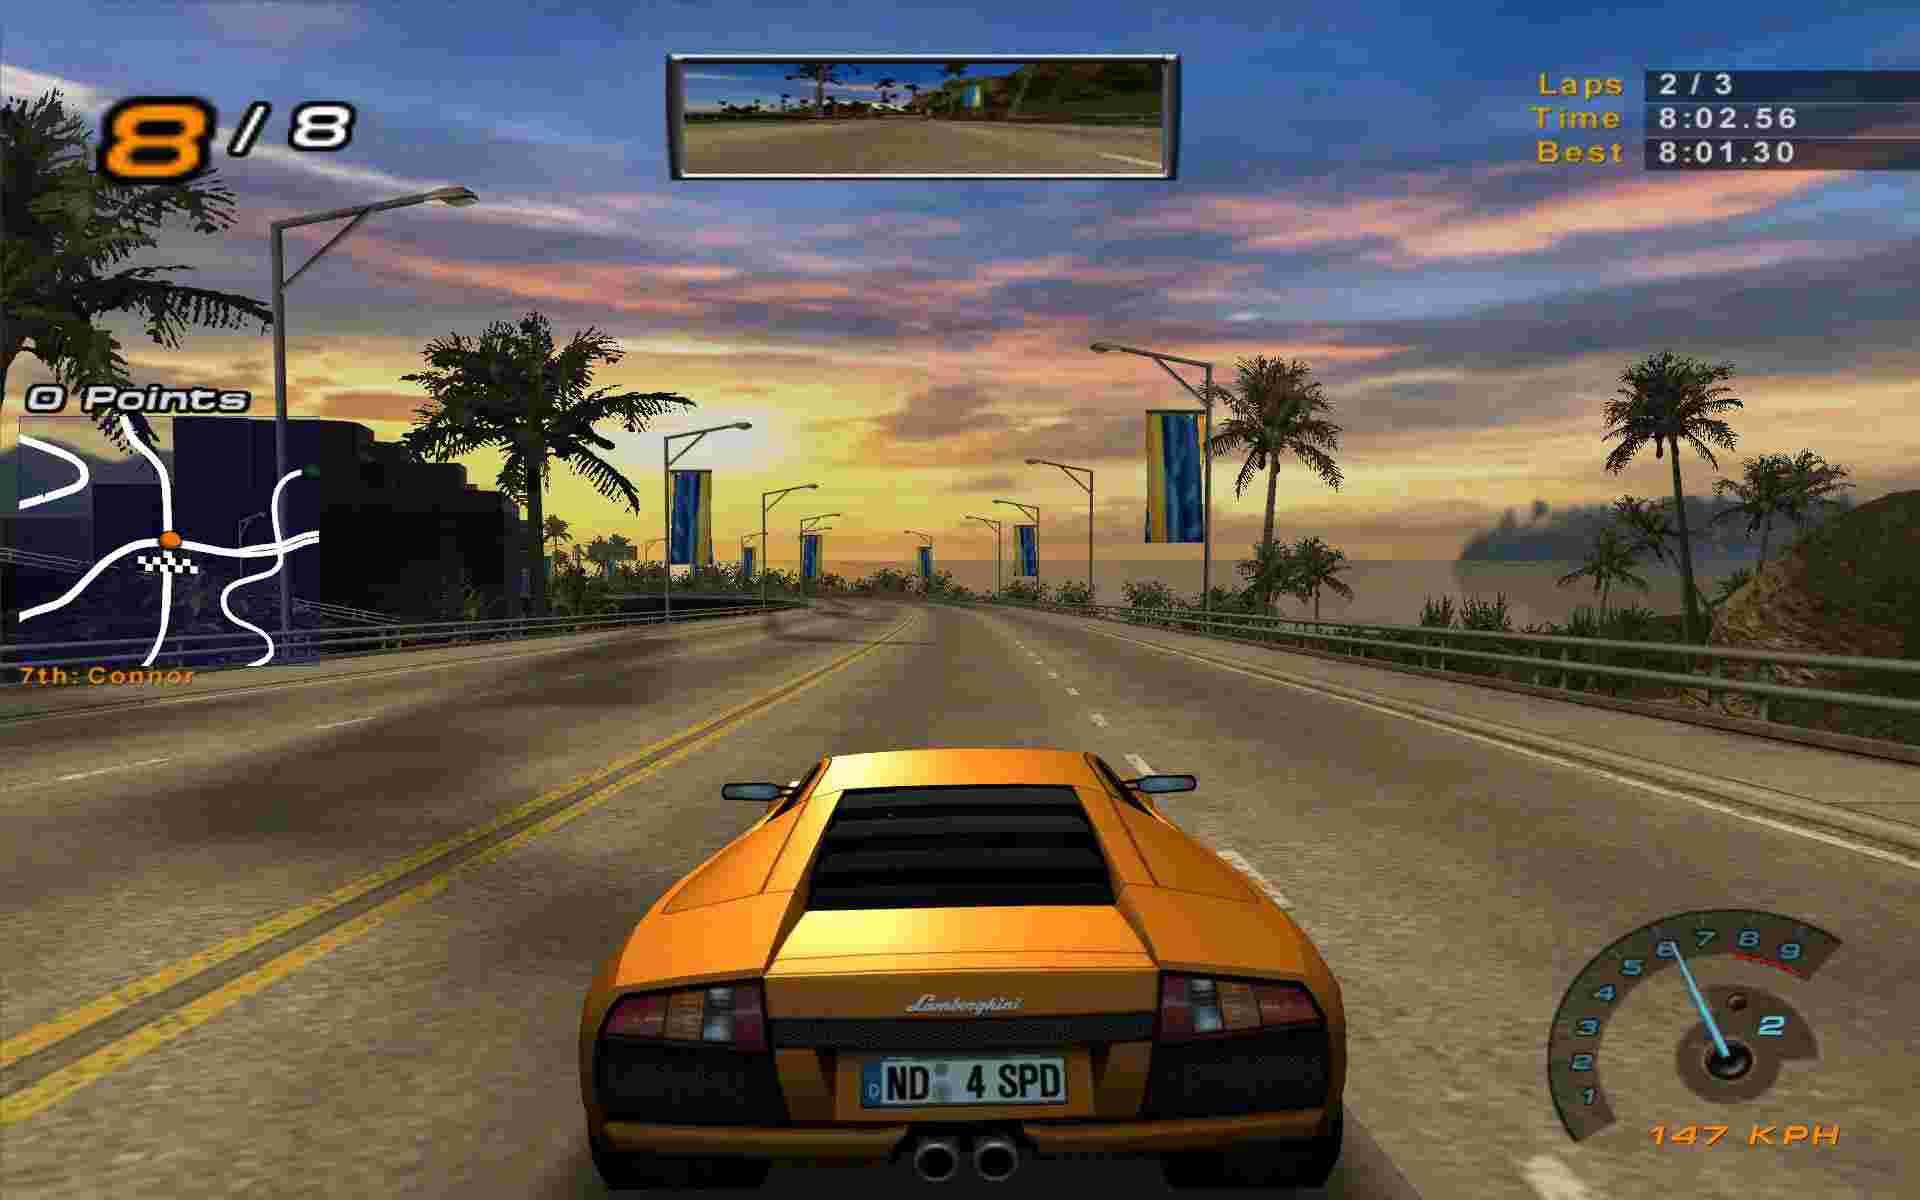 Історія серії Need for Speed. Частина 3 [High Stakes, Porsche Unleashed, Hot Pursuit 2]